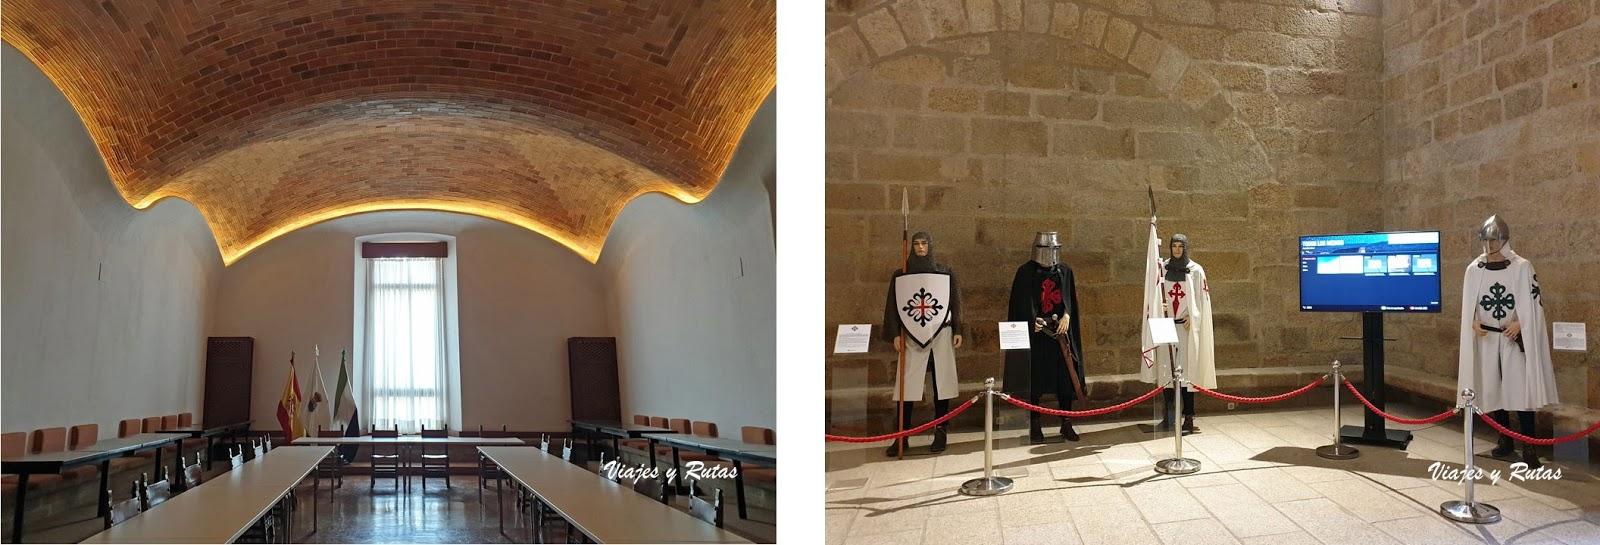 Dependencias del conventual de San Benito, Alcántara